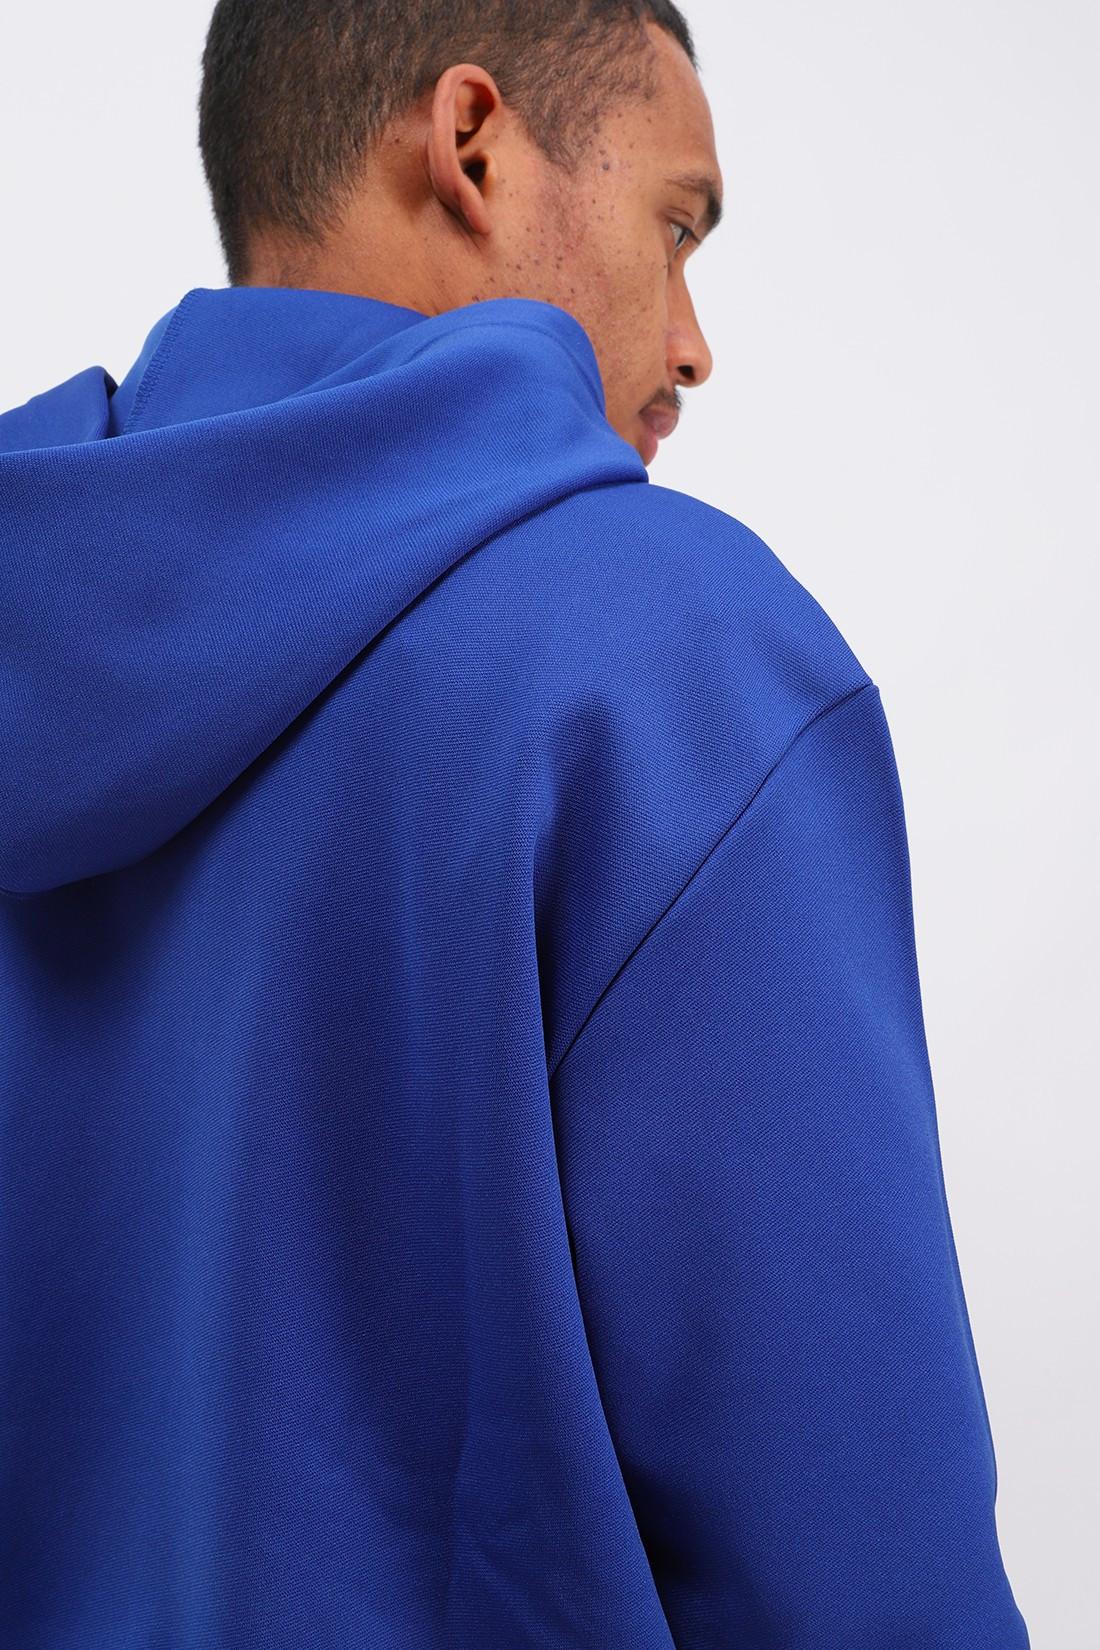 COMME DES GARÇONS PLAY / Play hooded sweatshirt Navy